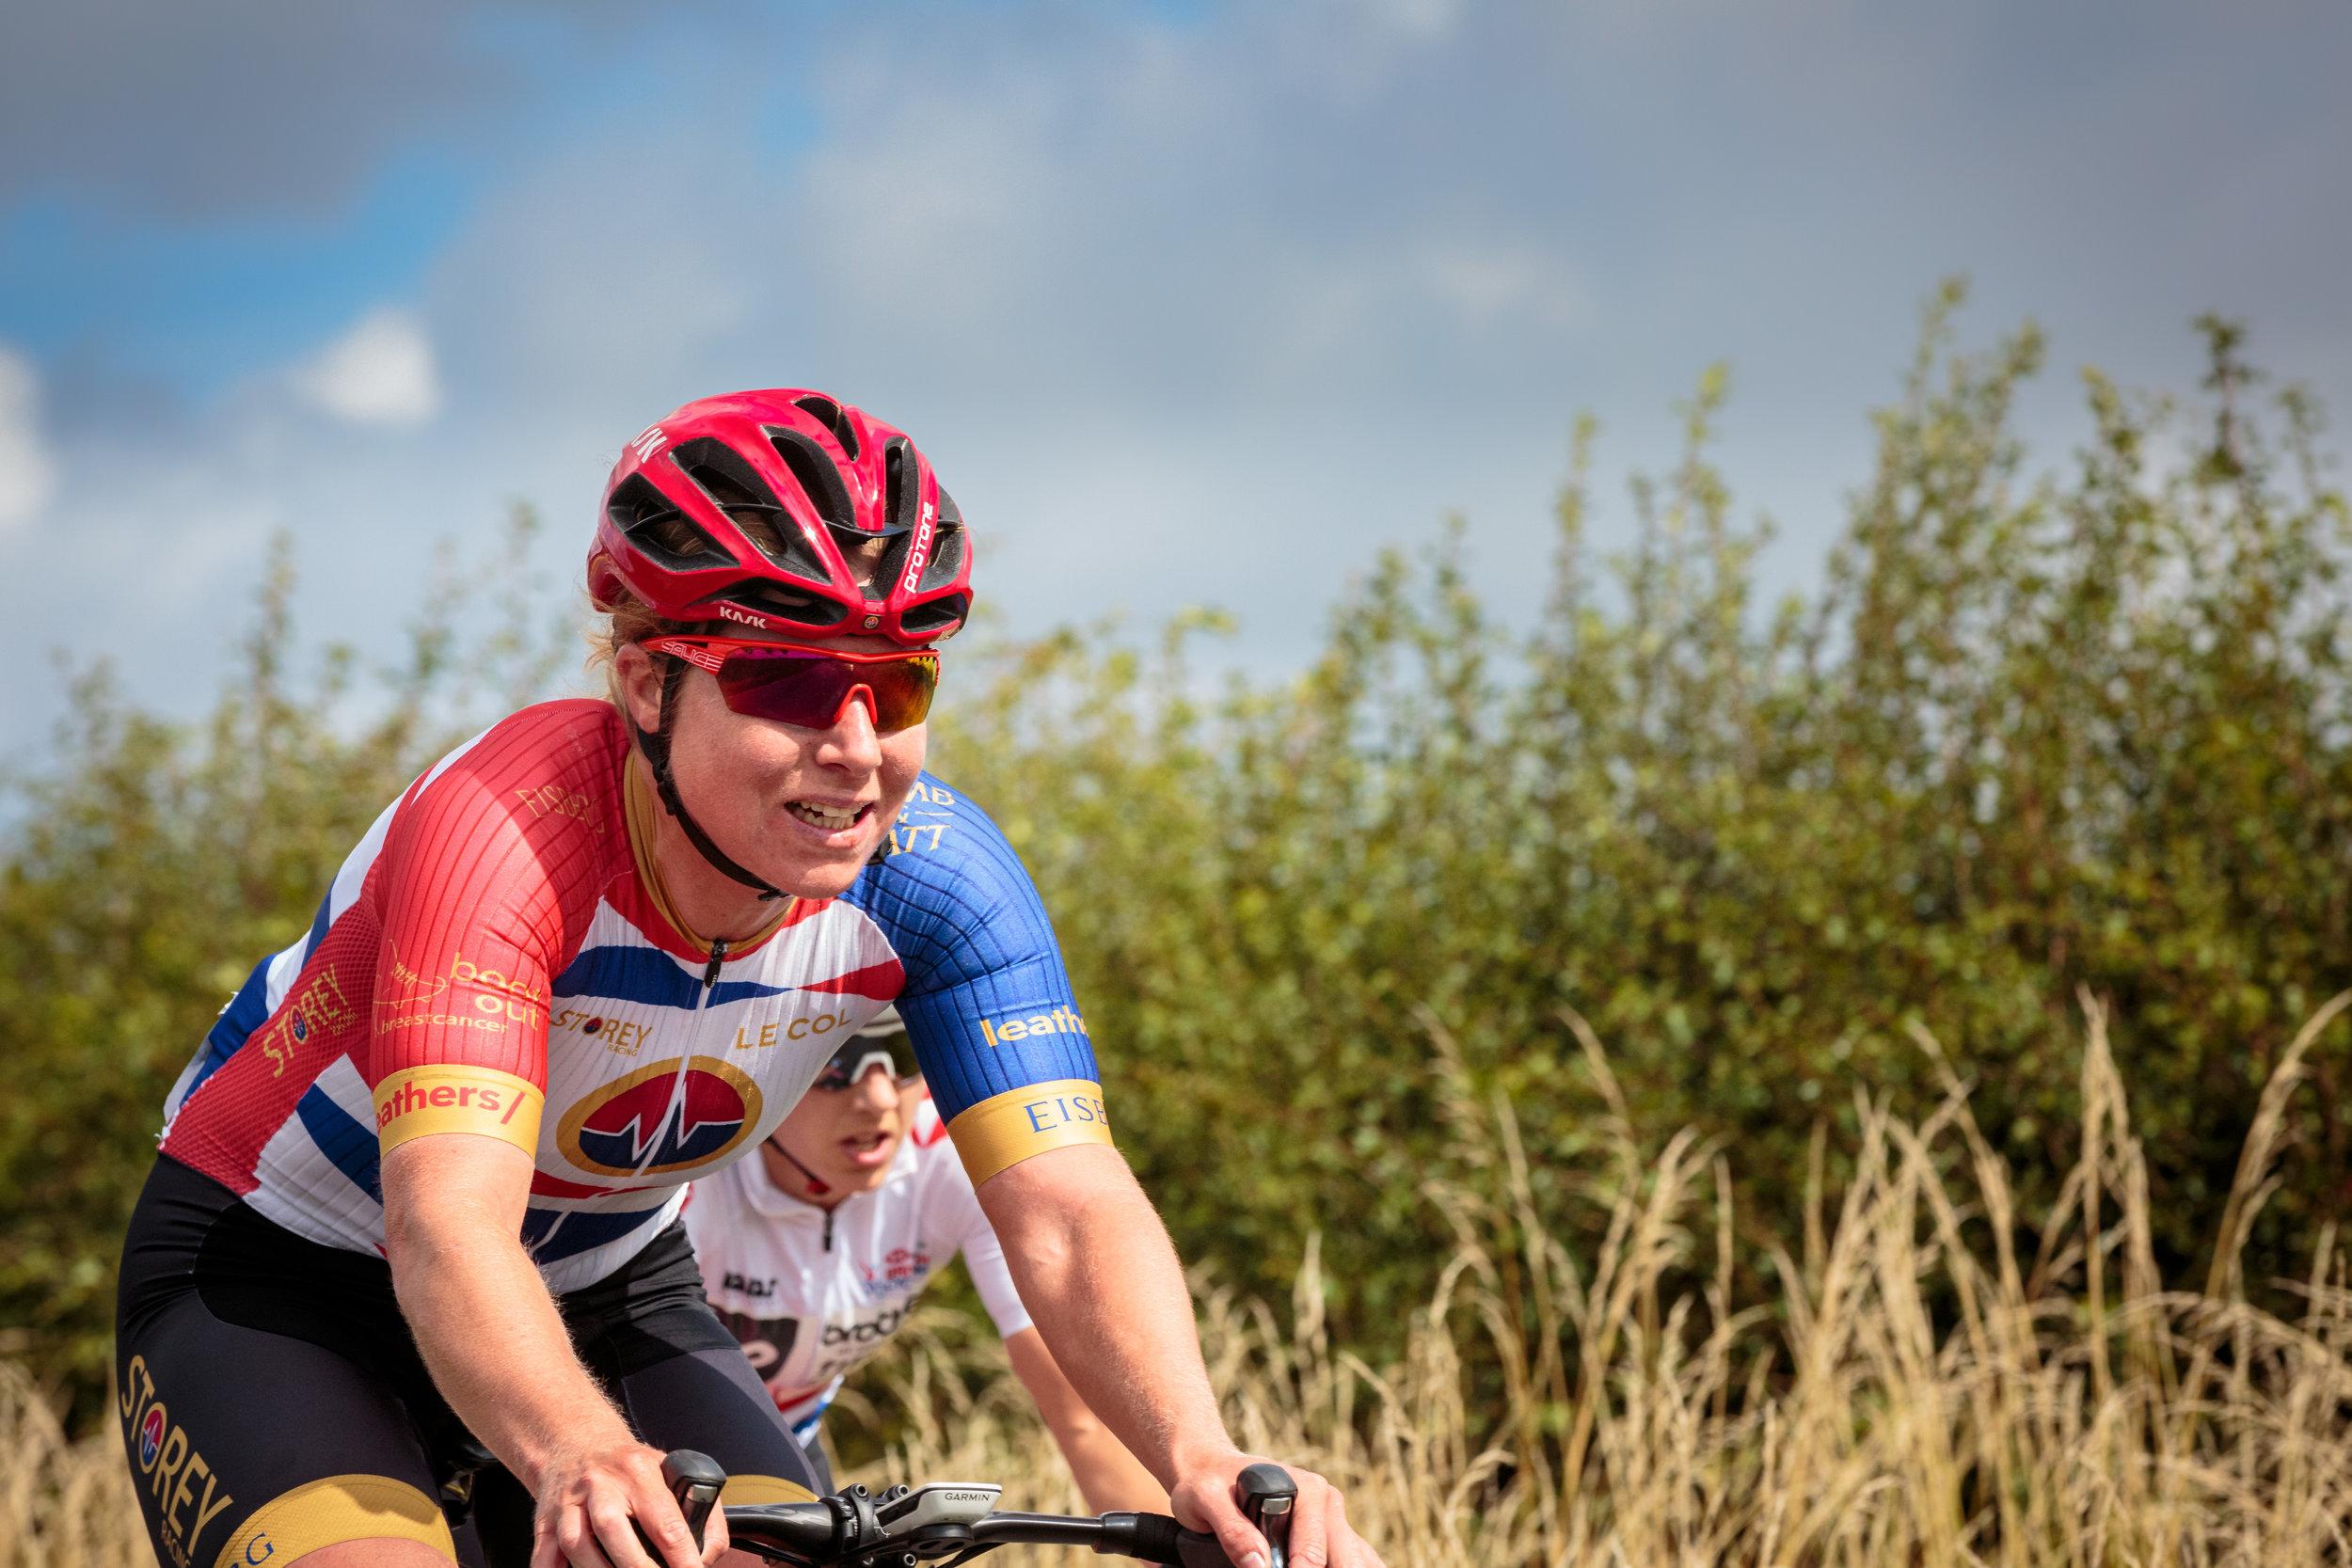 Team Storey Racing Suffering on the Climb